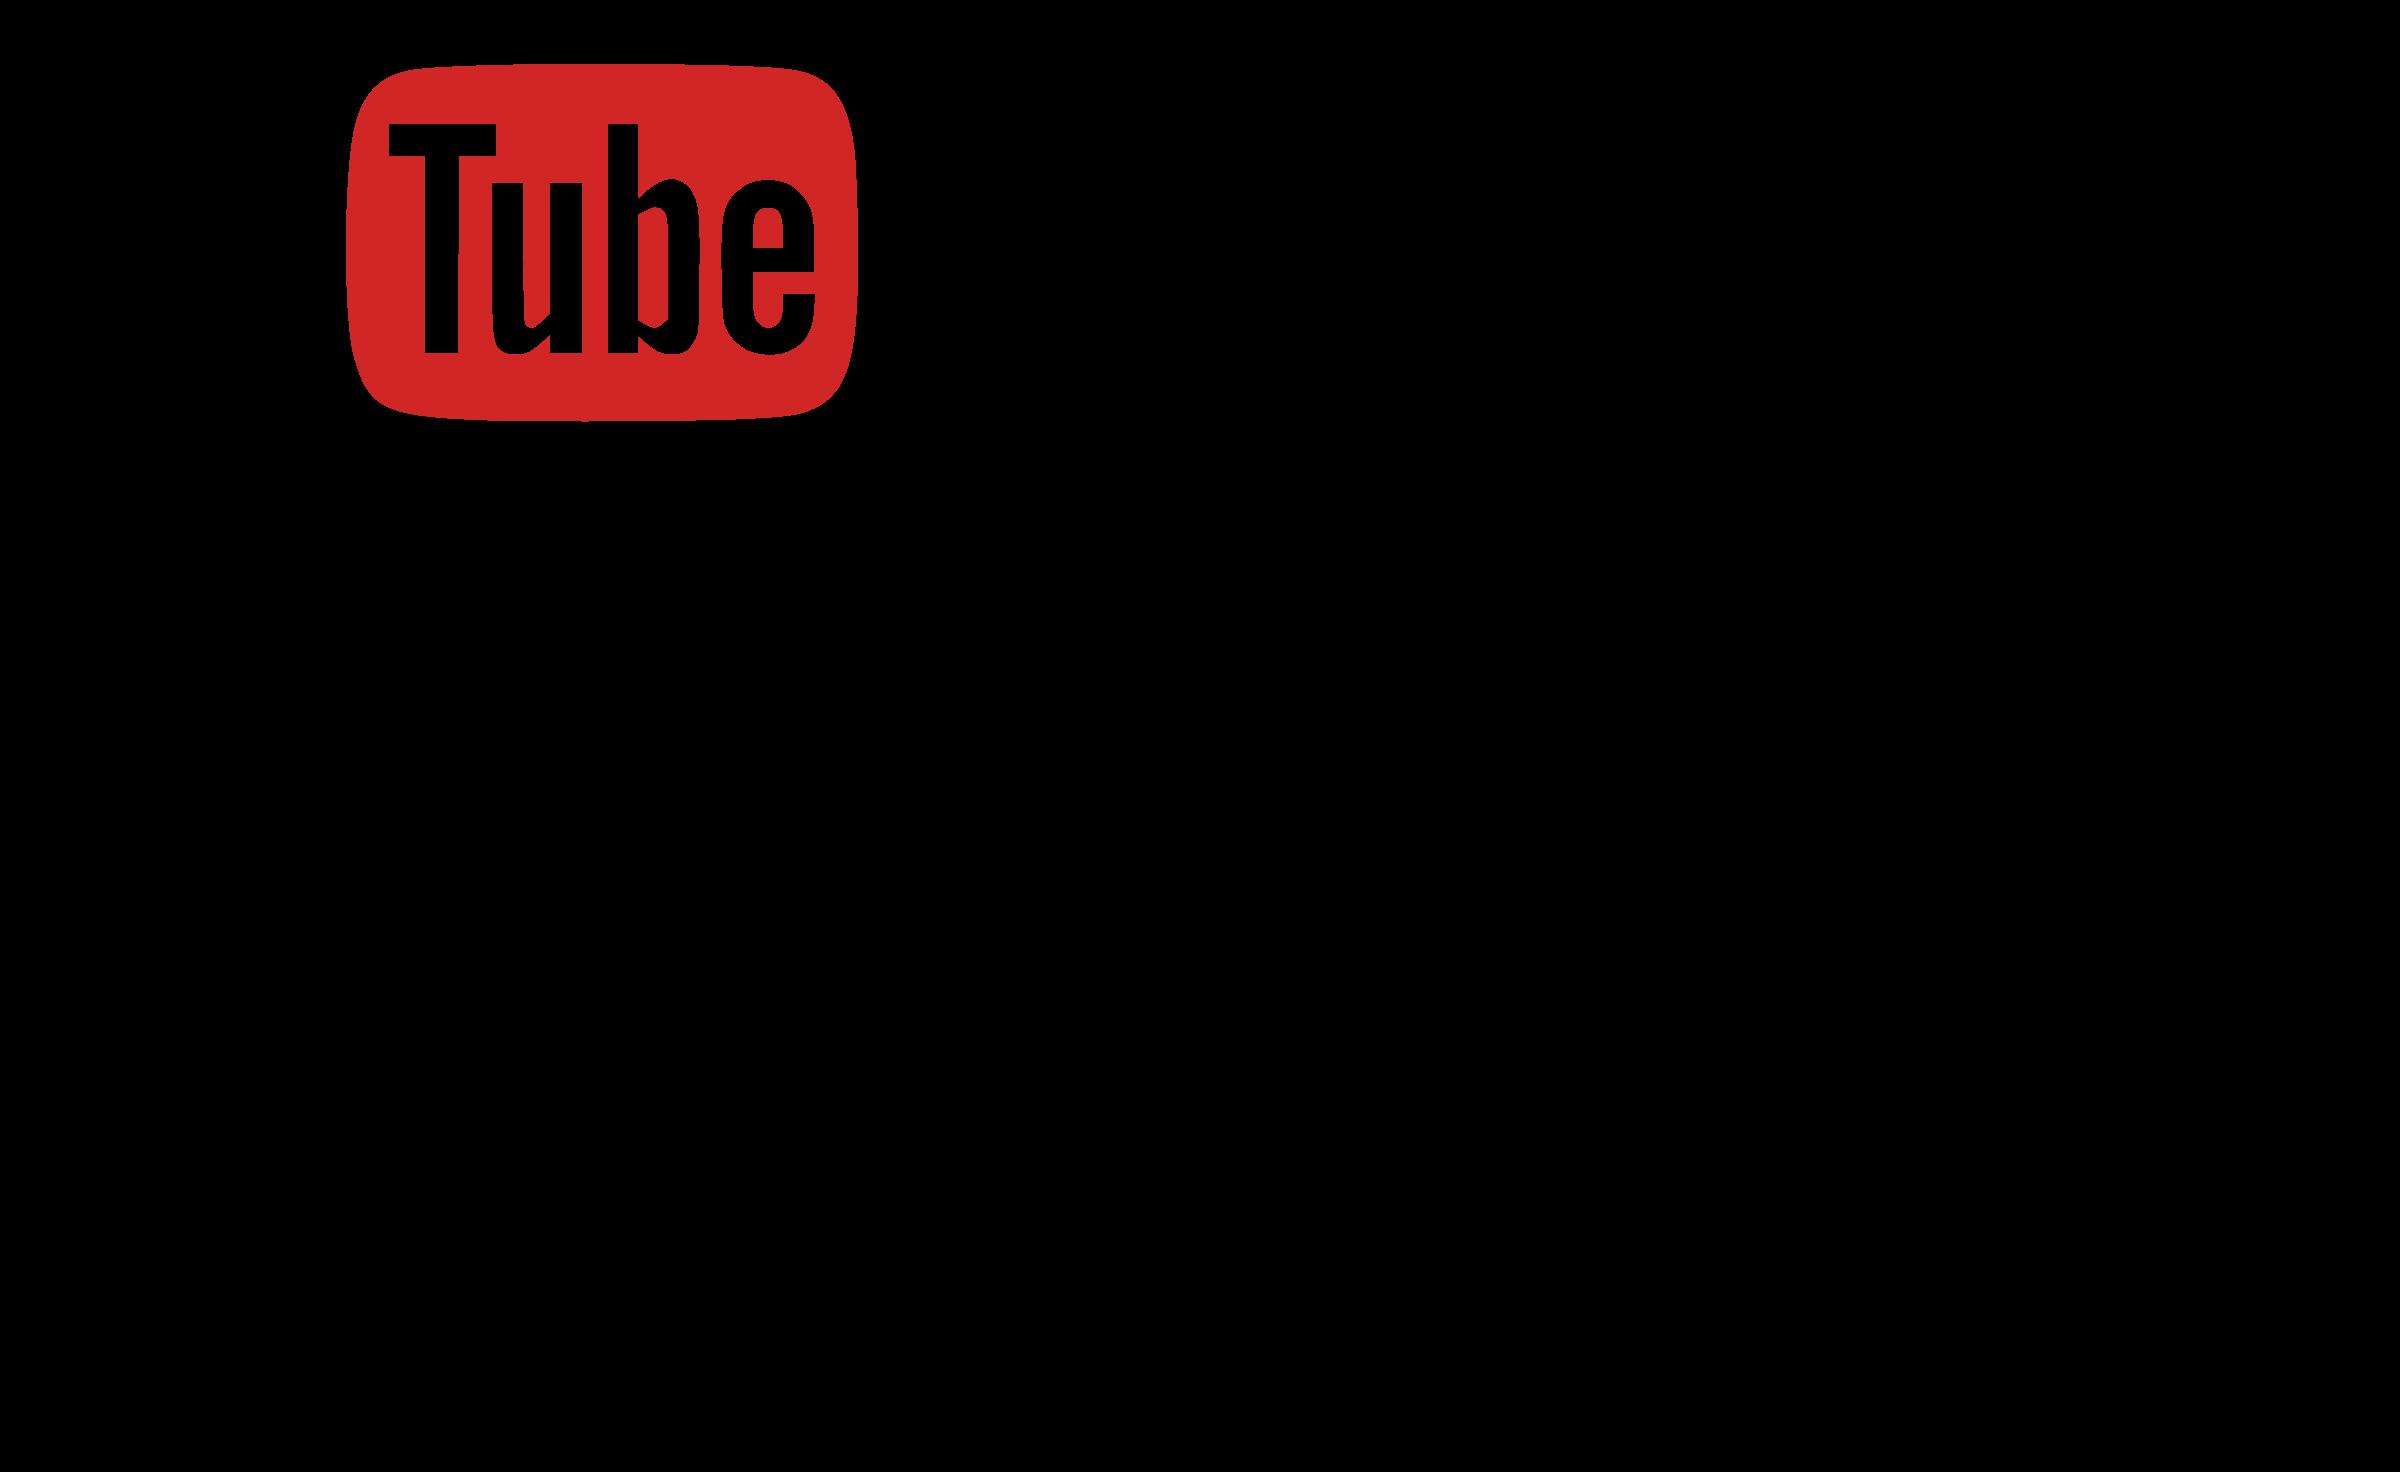 2400x1472 Youtube For Kids Logo Png Transparent Amp Svg Vector